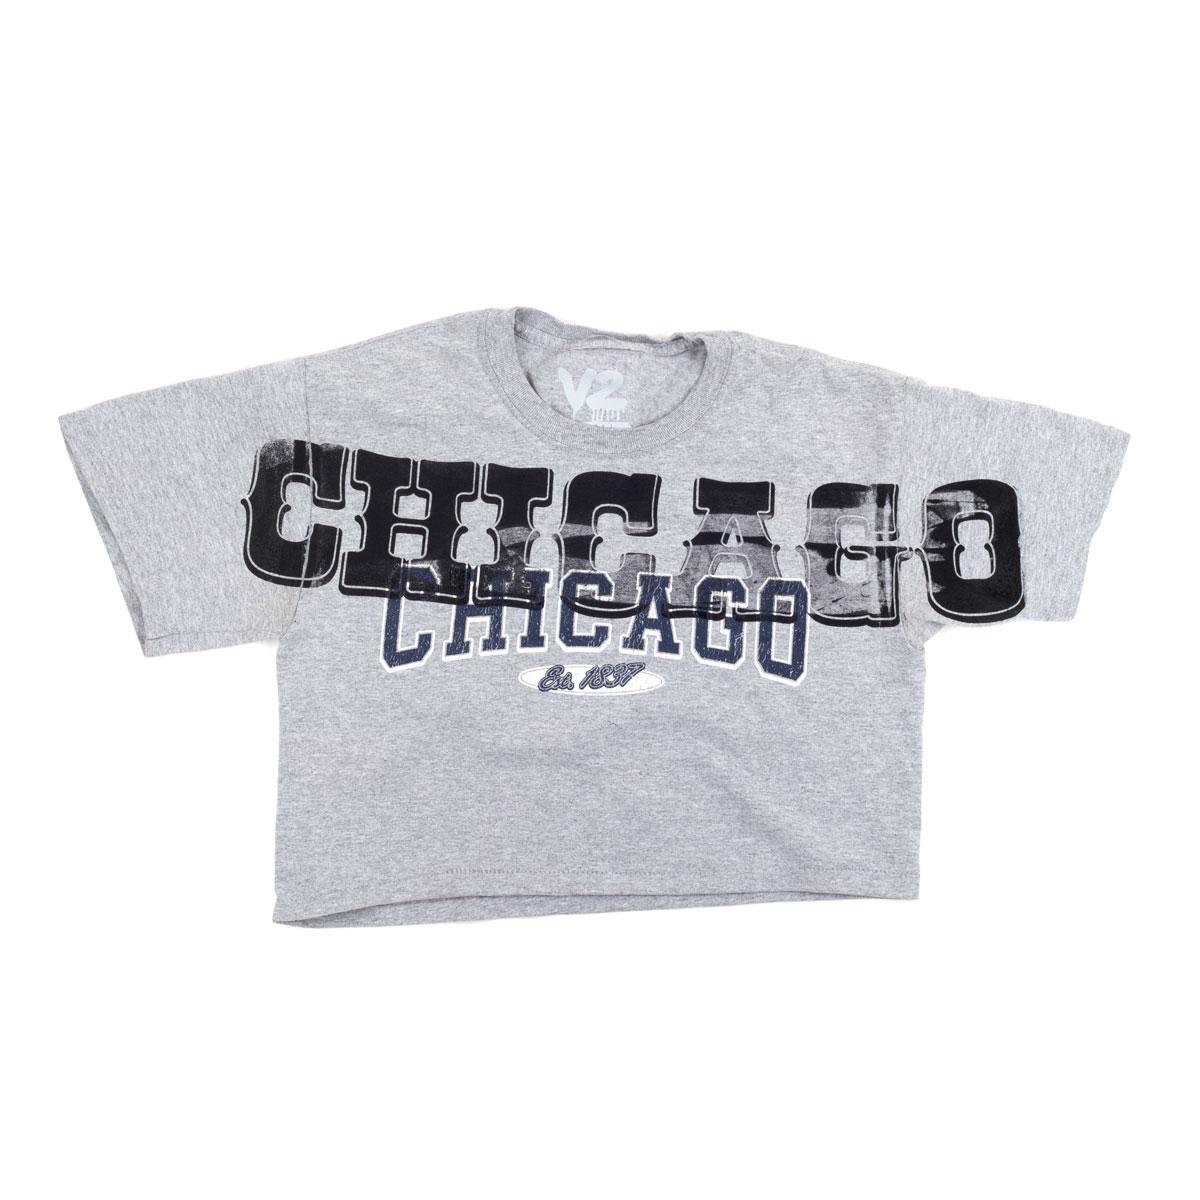 Chicago Crop Top T-Shirt (S)